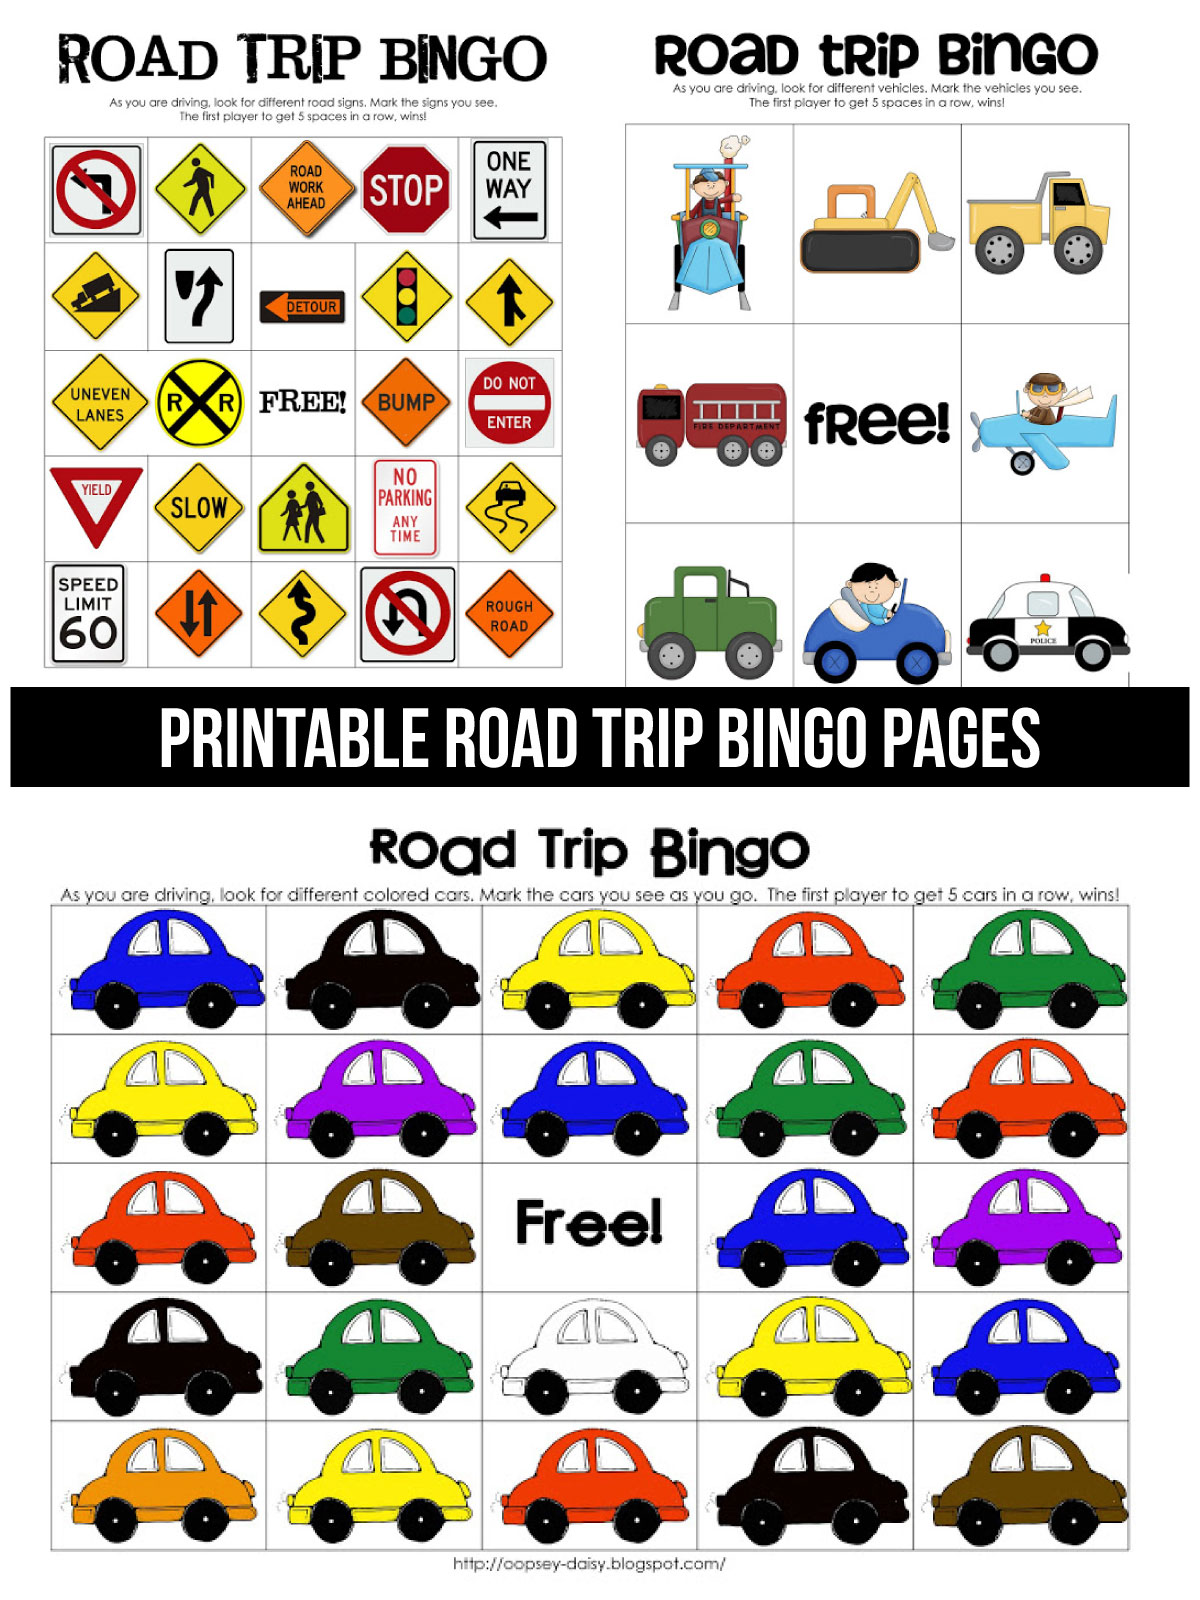 Printable Road Trip Bingo